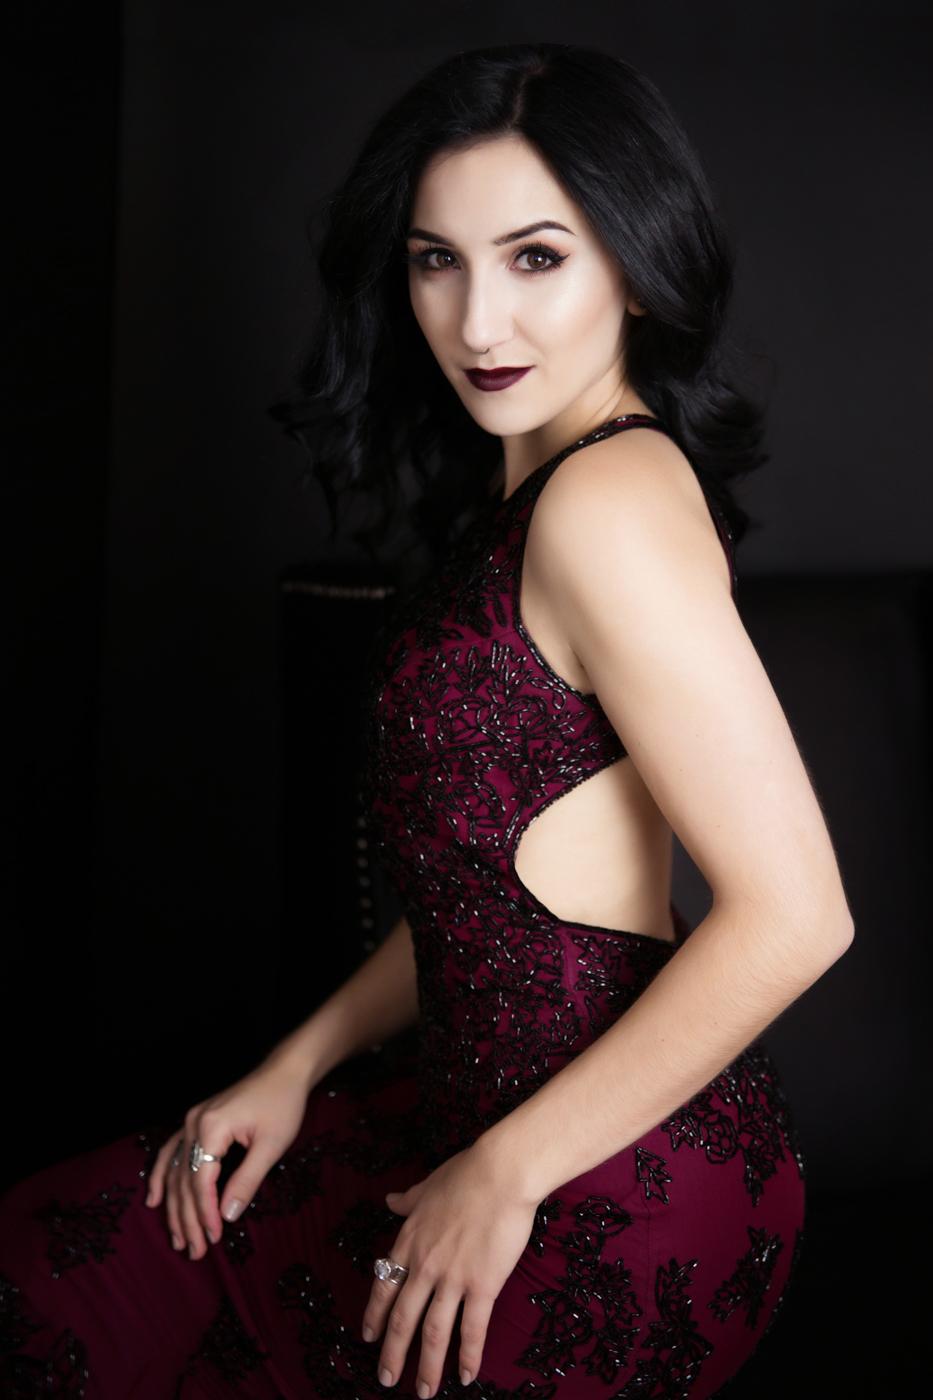 Jessica-Daniel-Engagement-Photo-Shoot-in-the-heart-of-Washington-DC-Ksenia-Pro-Photography-19